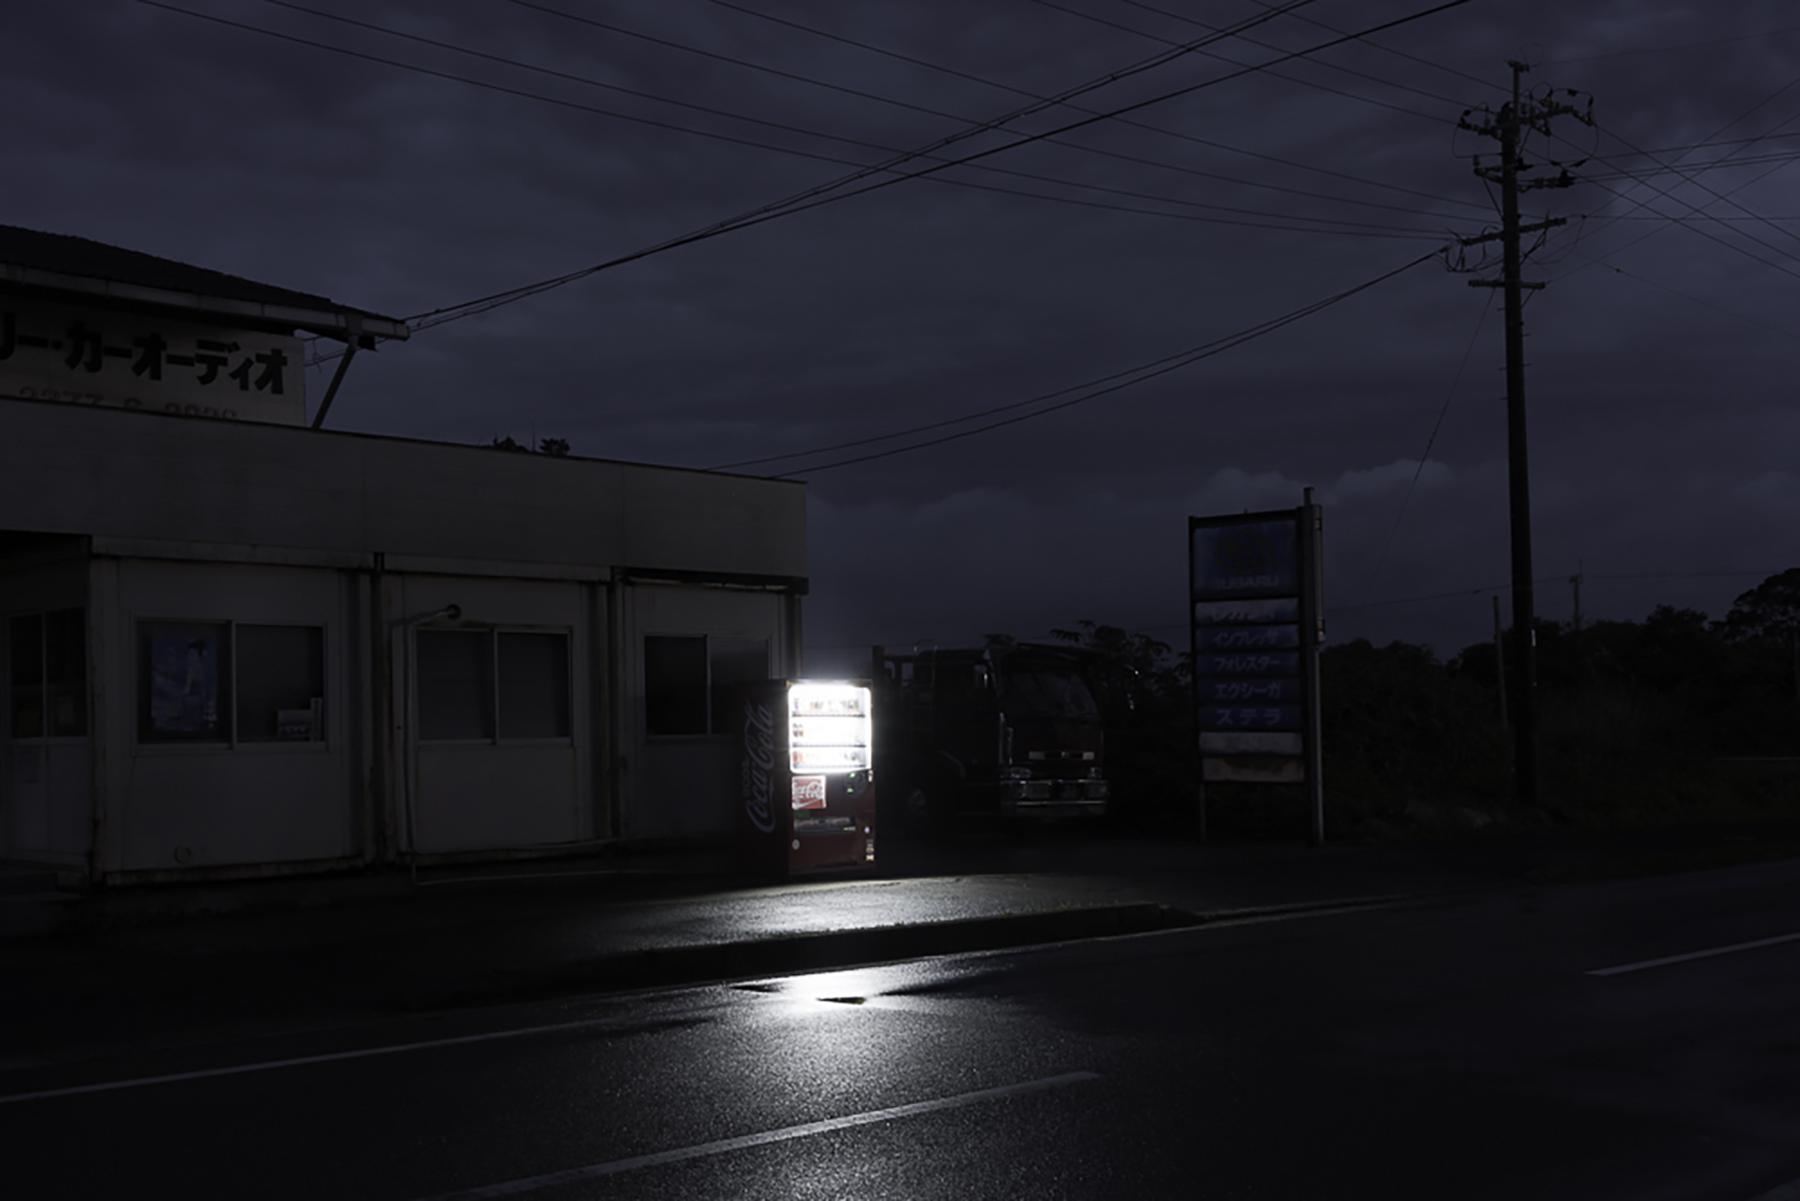 iGNANT-Julien-Mauve-After-Lights-Out-11